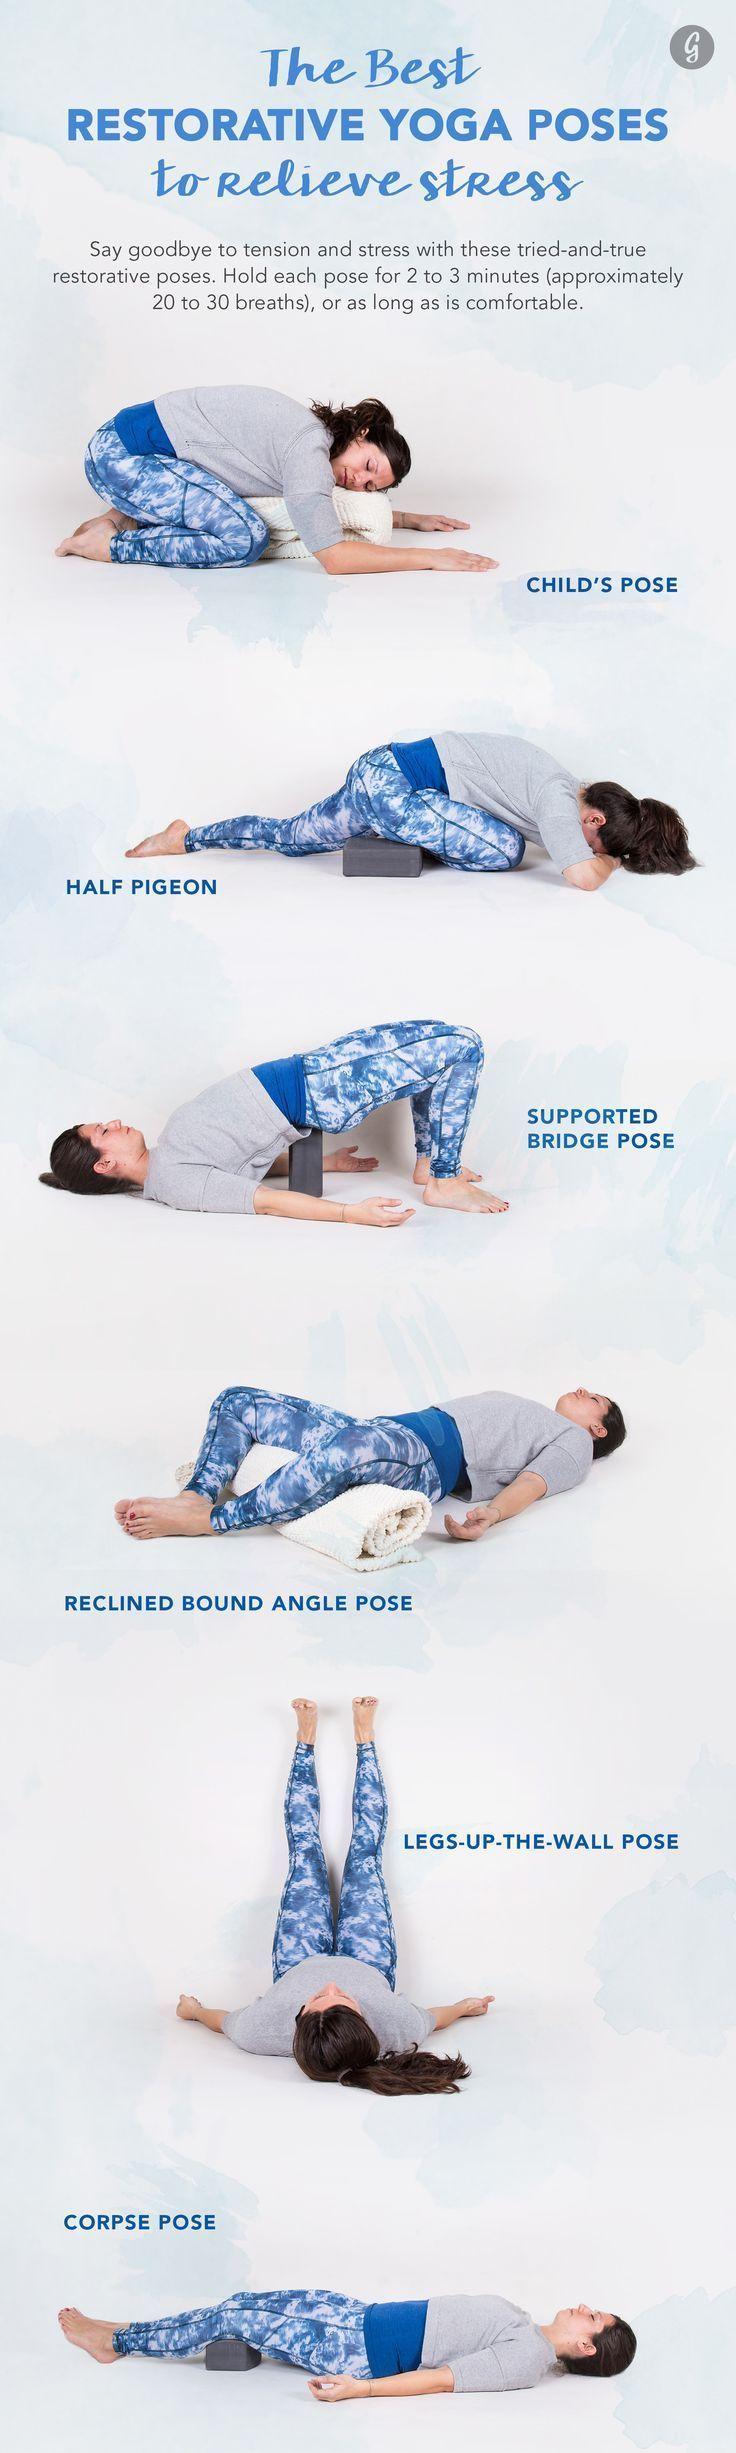 The Best Restorative Yoga Poses #stress #relief #yoga